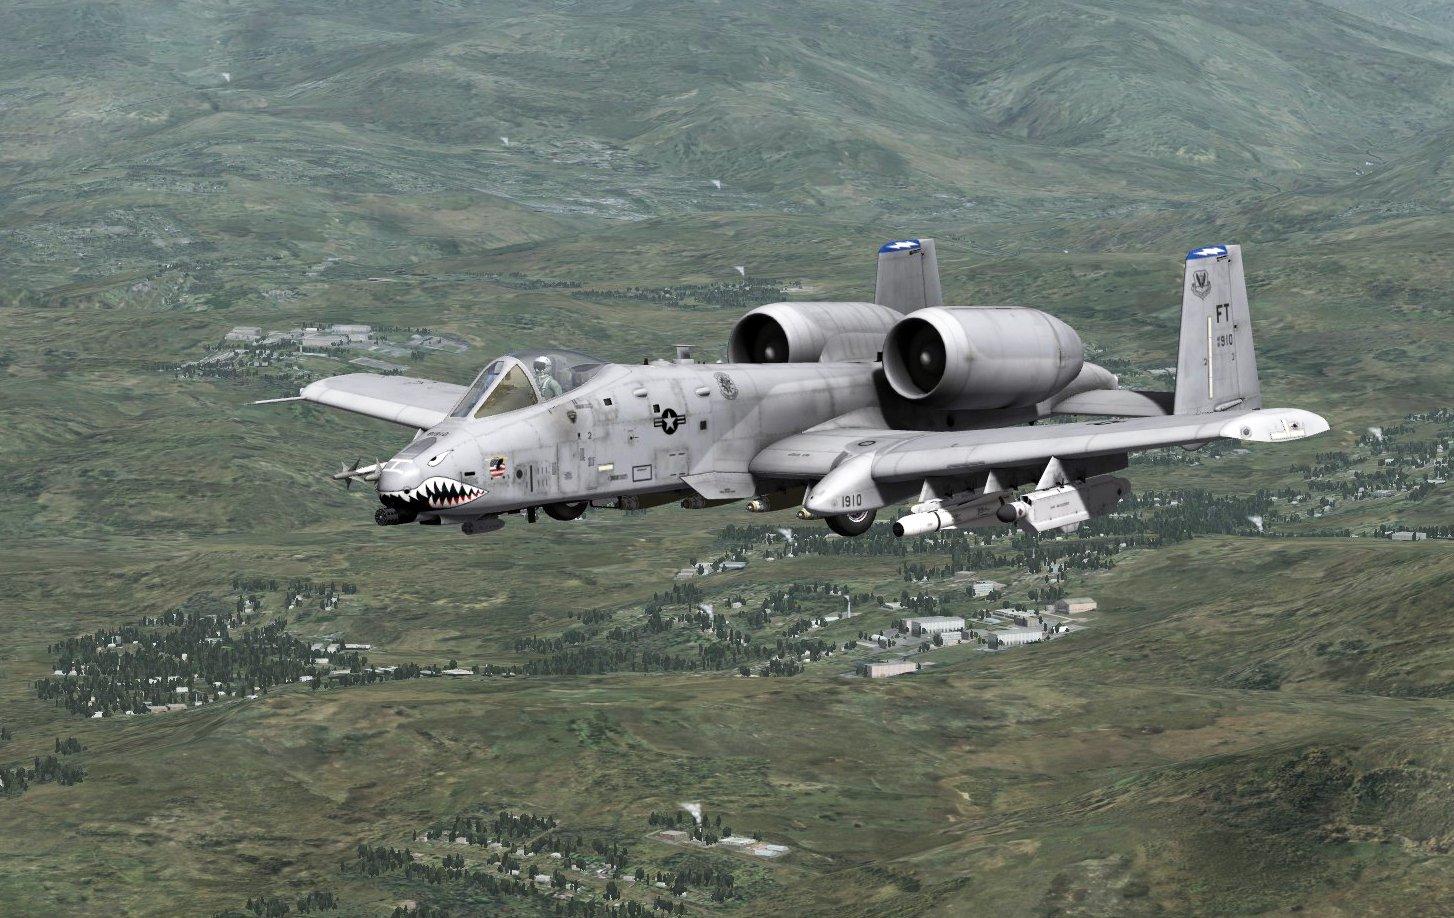 Digital Combat Simulator - A-10C by skyhawkmlt on DeviantArt